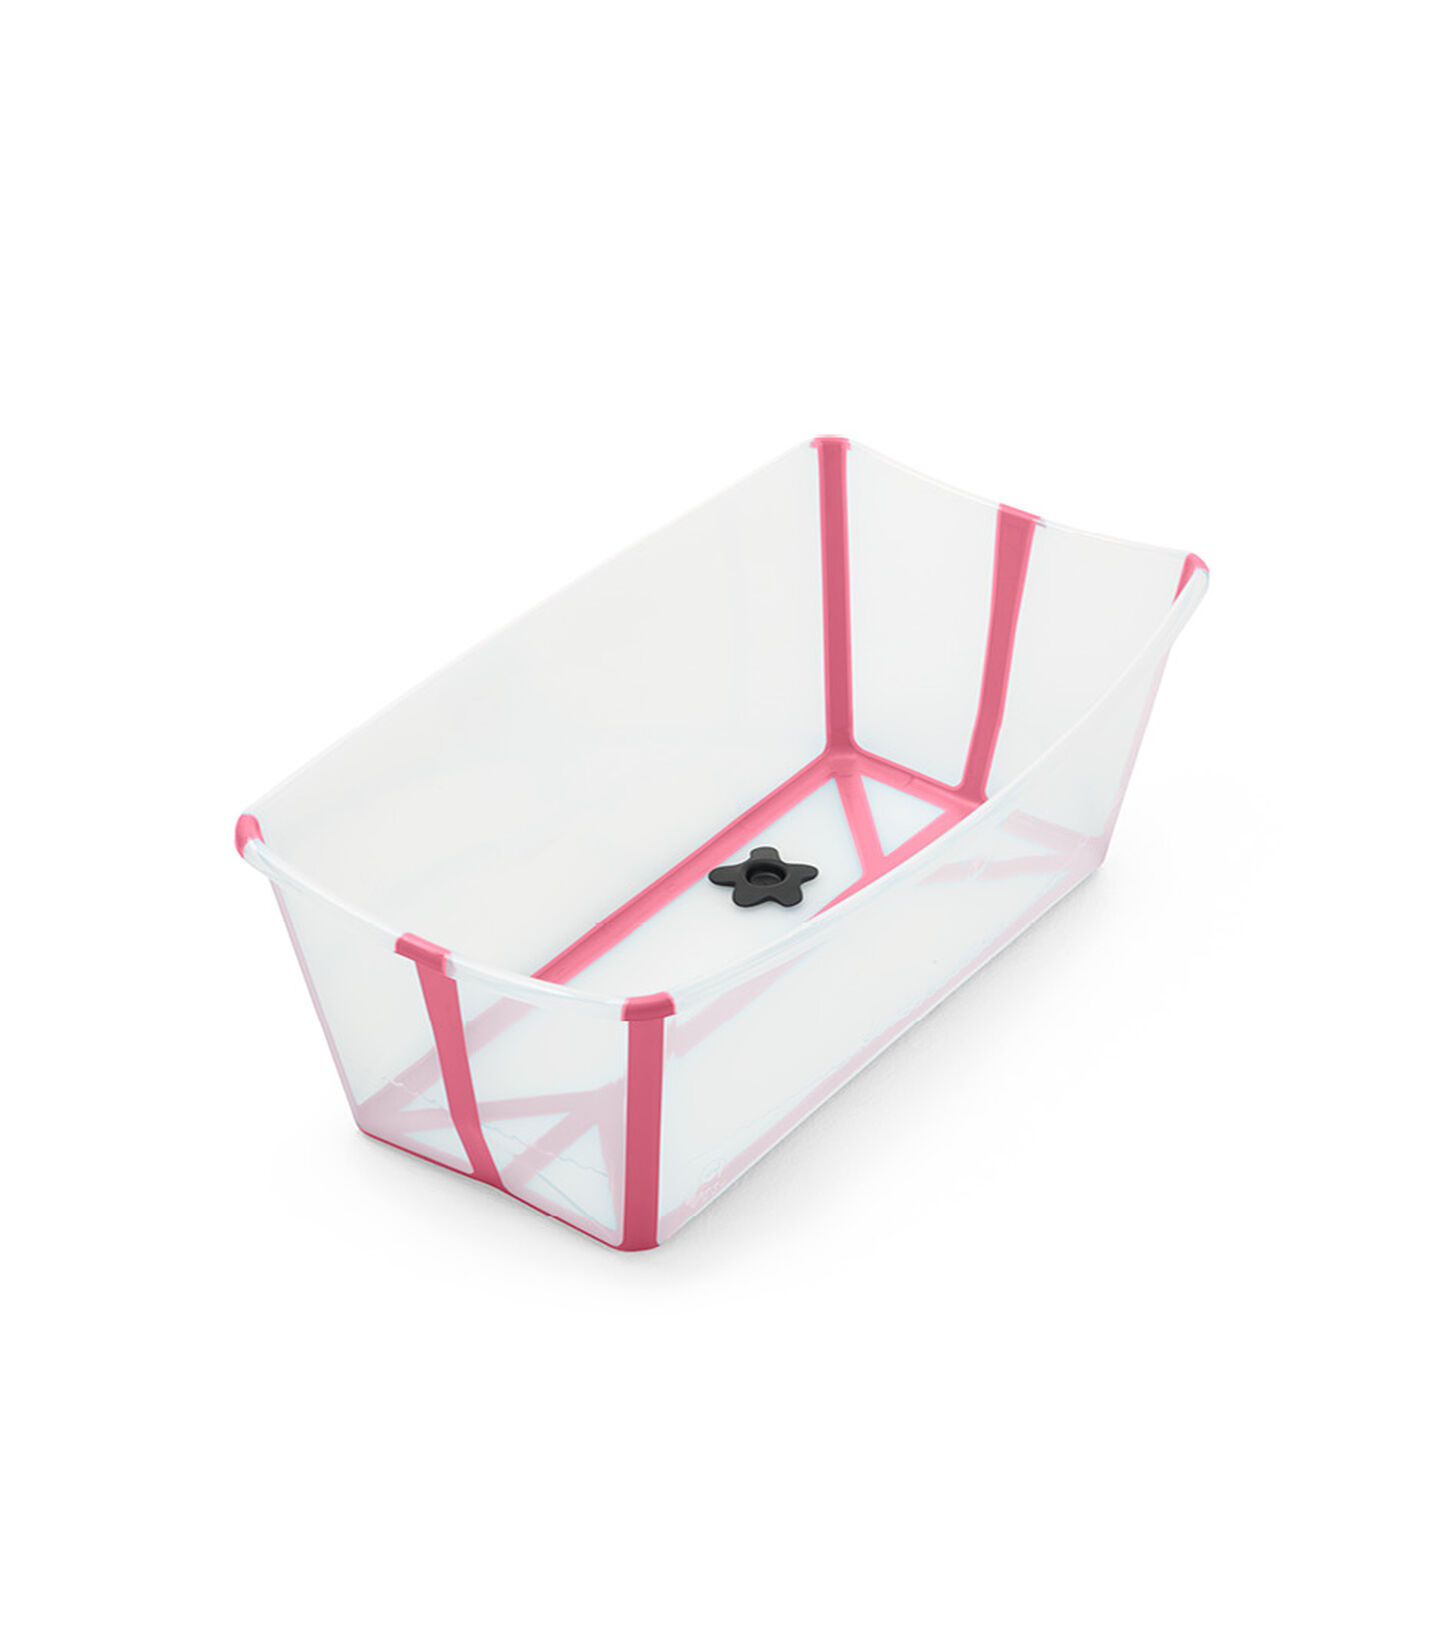 Stokke® Flexi Bath® Heat Trans Pink, Transparent rose, mainview view 1